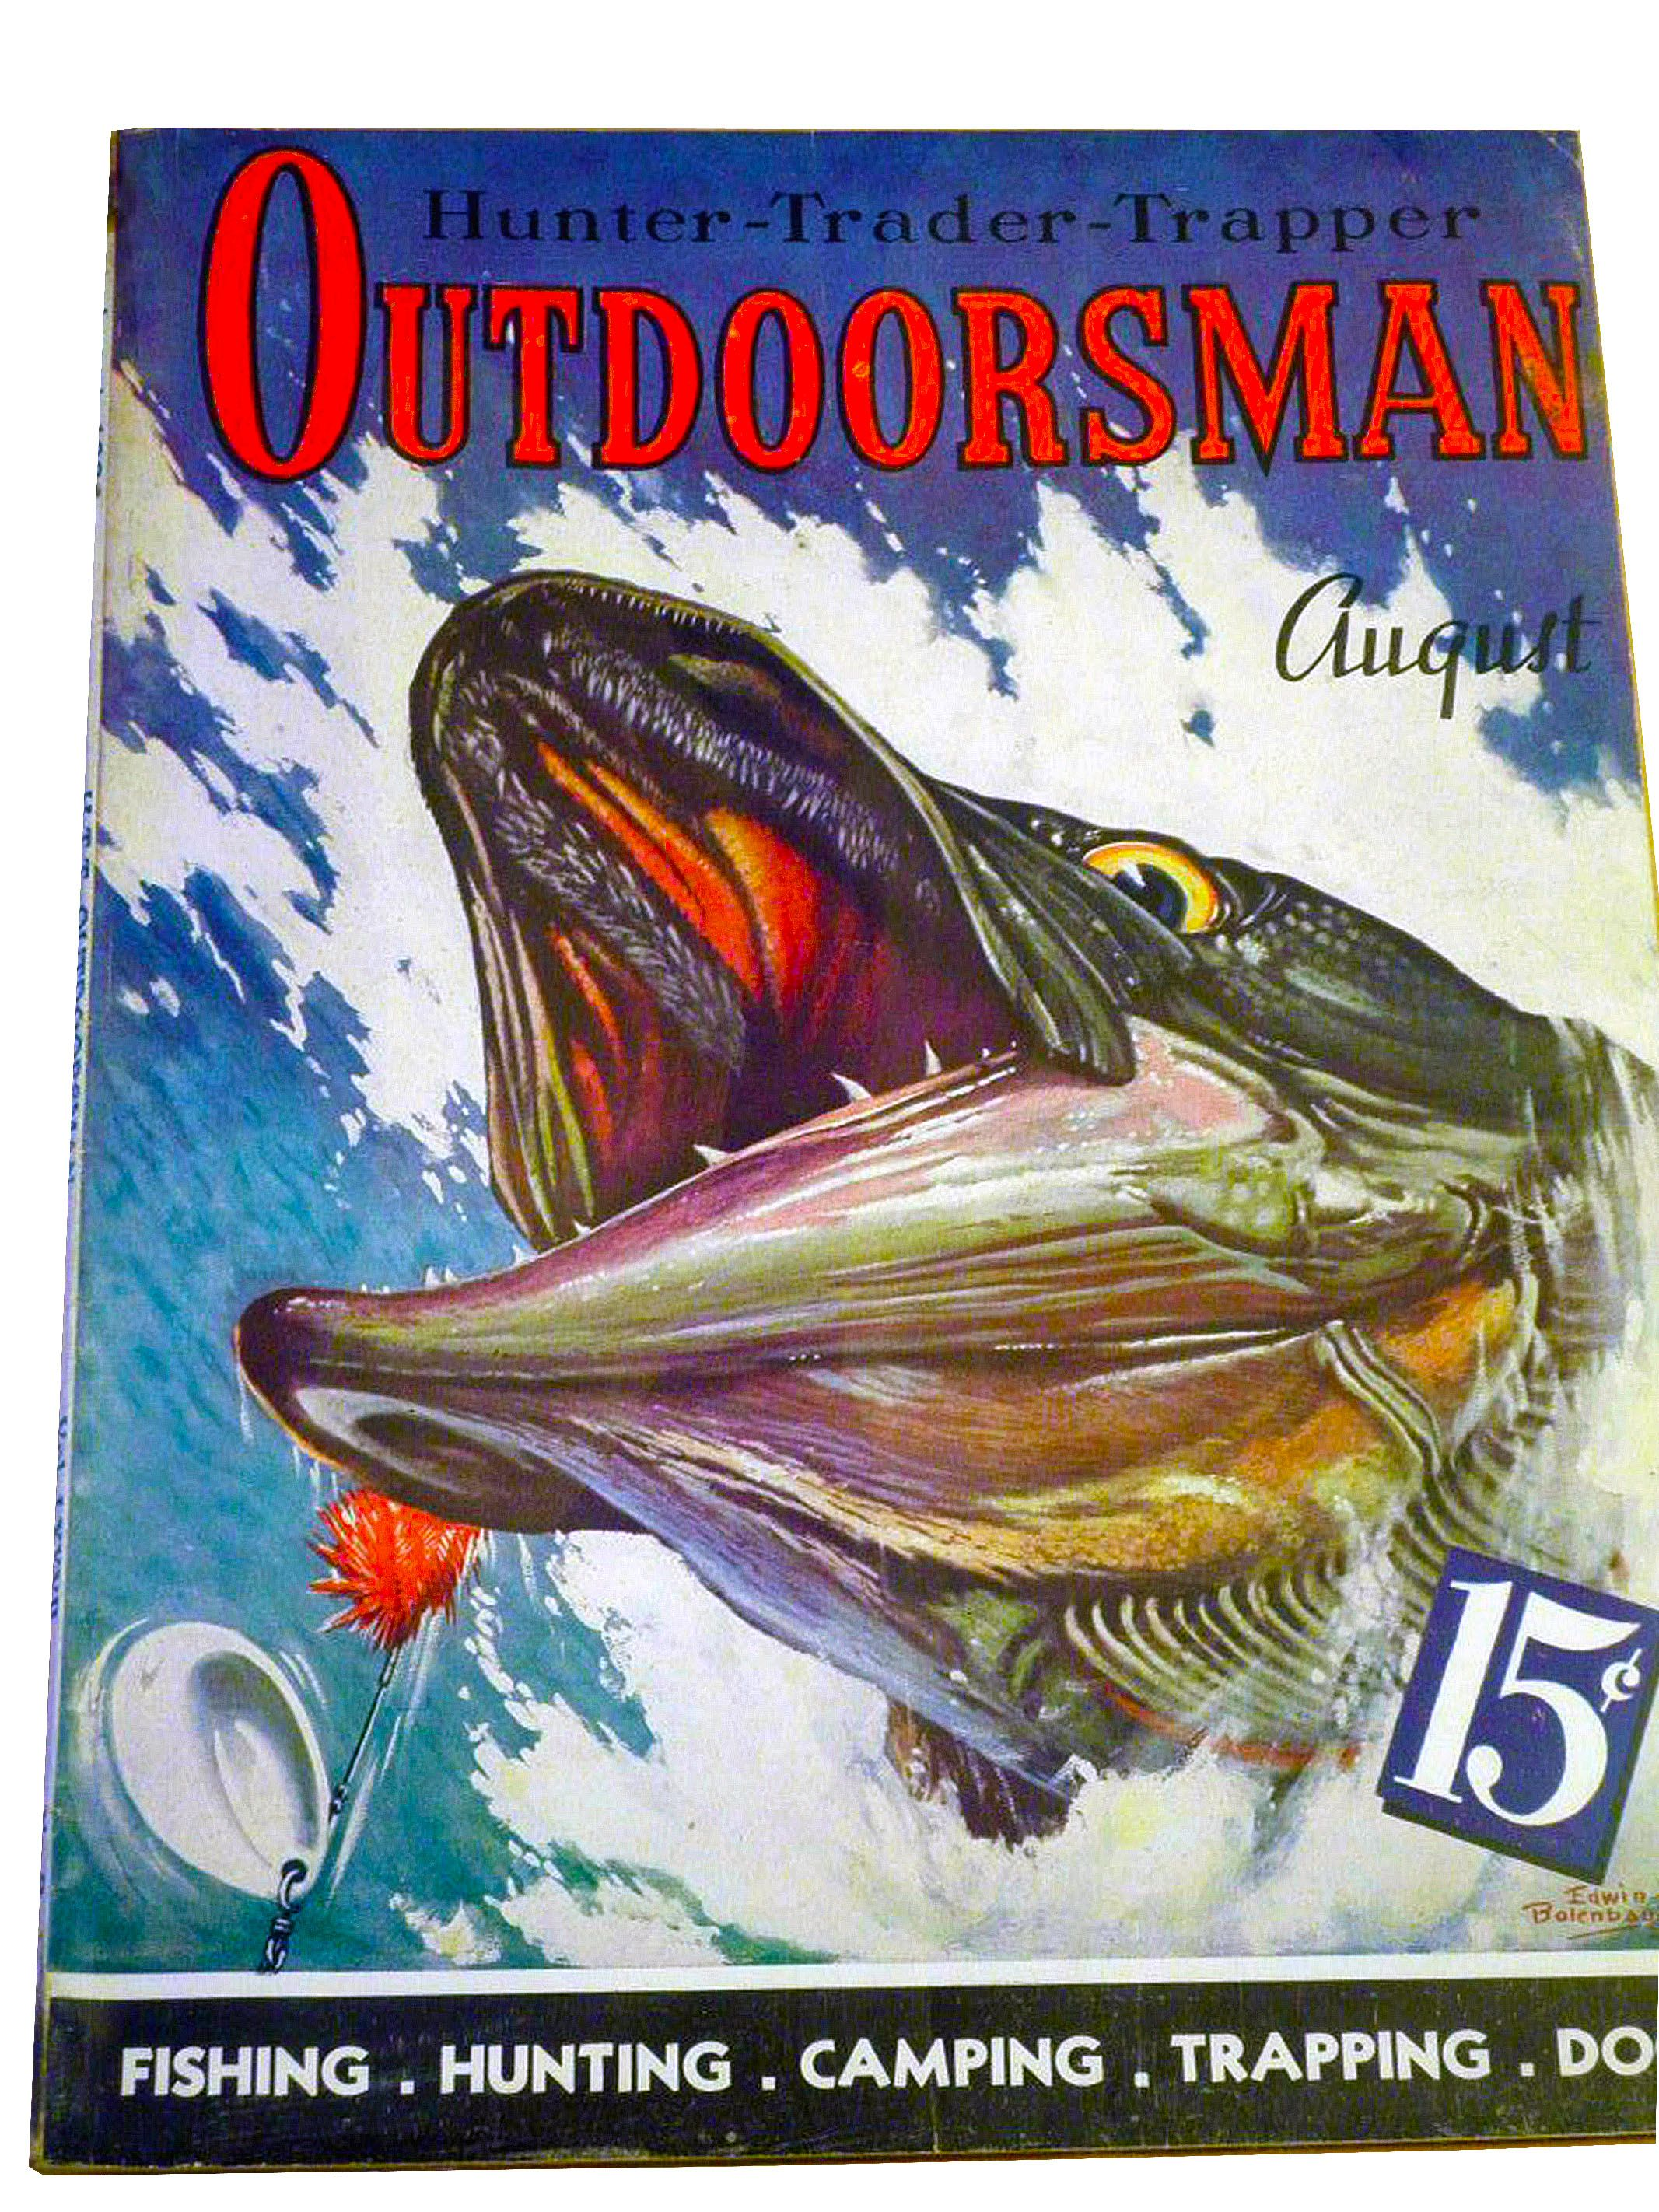 Outdoorsmanaugust hunting fishing magazine covers for Hunting and fishing magazine